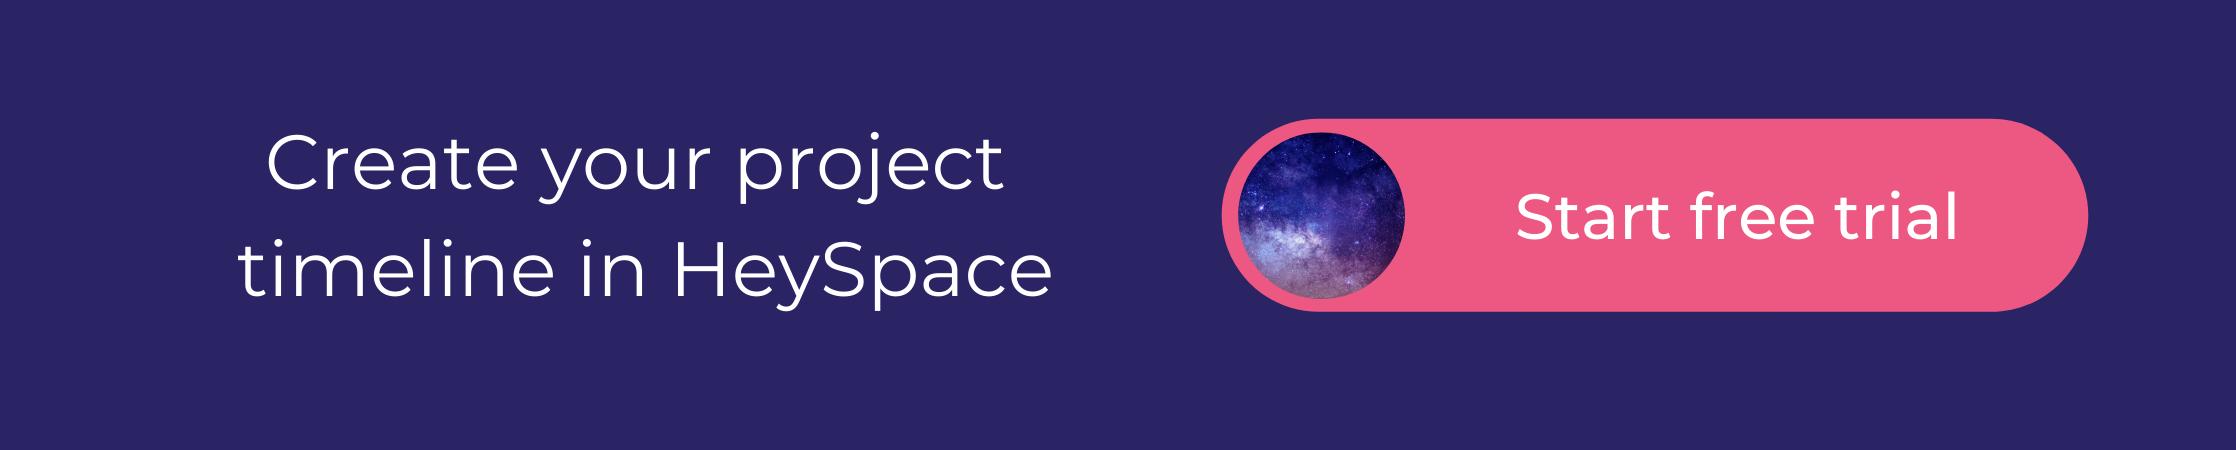 heyspace banner